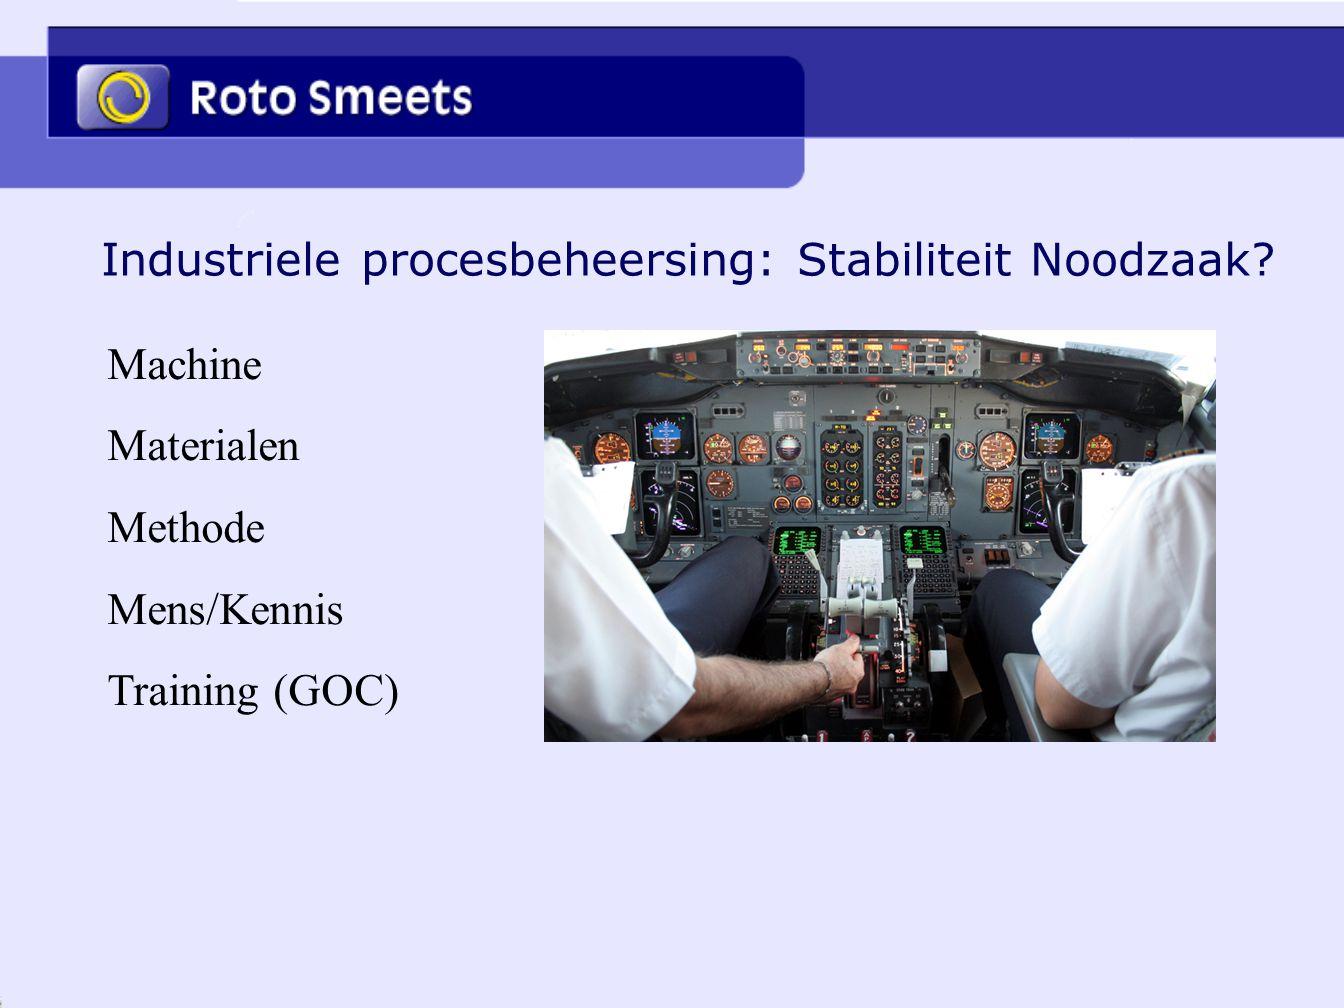 Industriele procesbeheersing: Stabiliteit Noodzaak? Machine Materialen Methode Mens/Kennis Training (GOC)